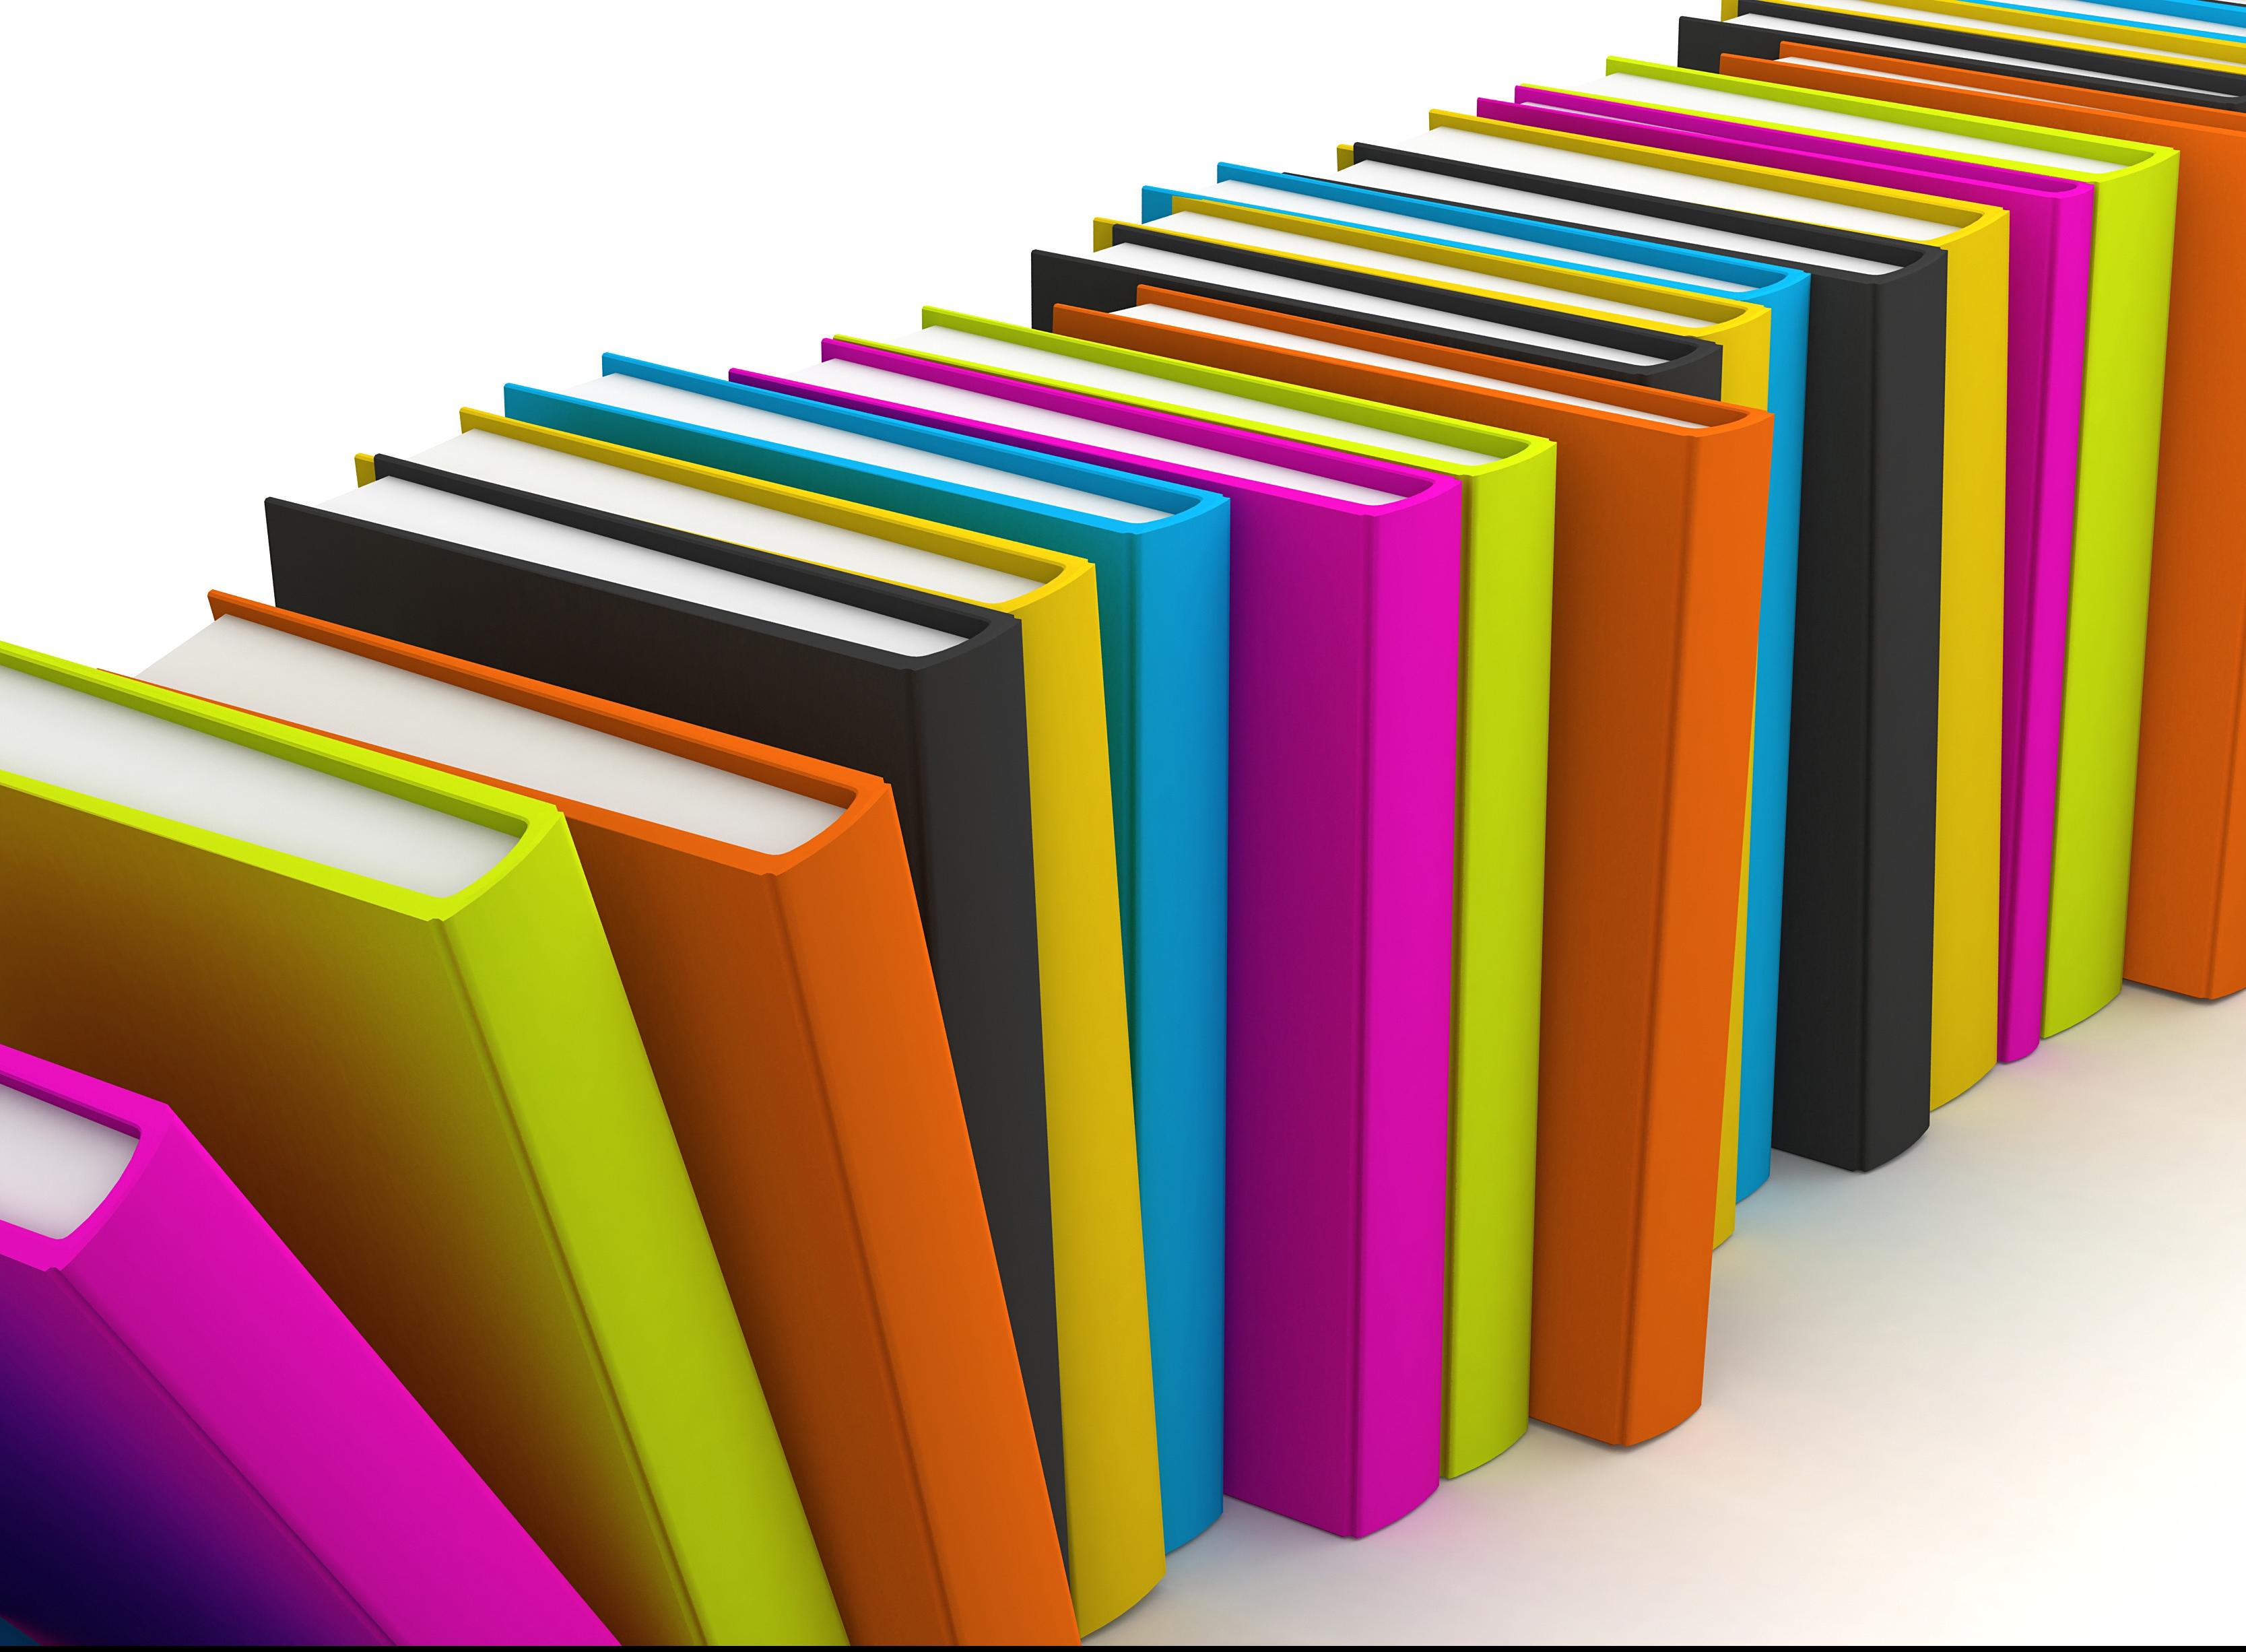 books_G1l7v8du